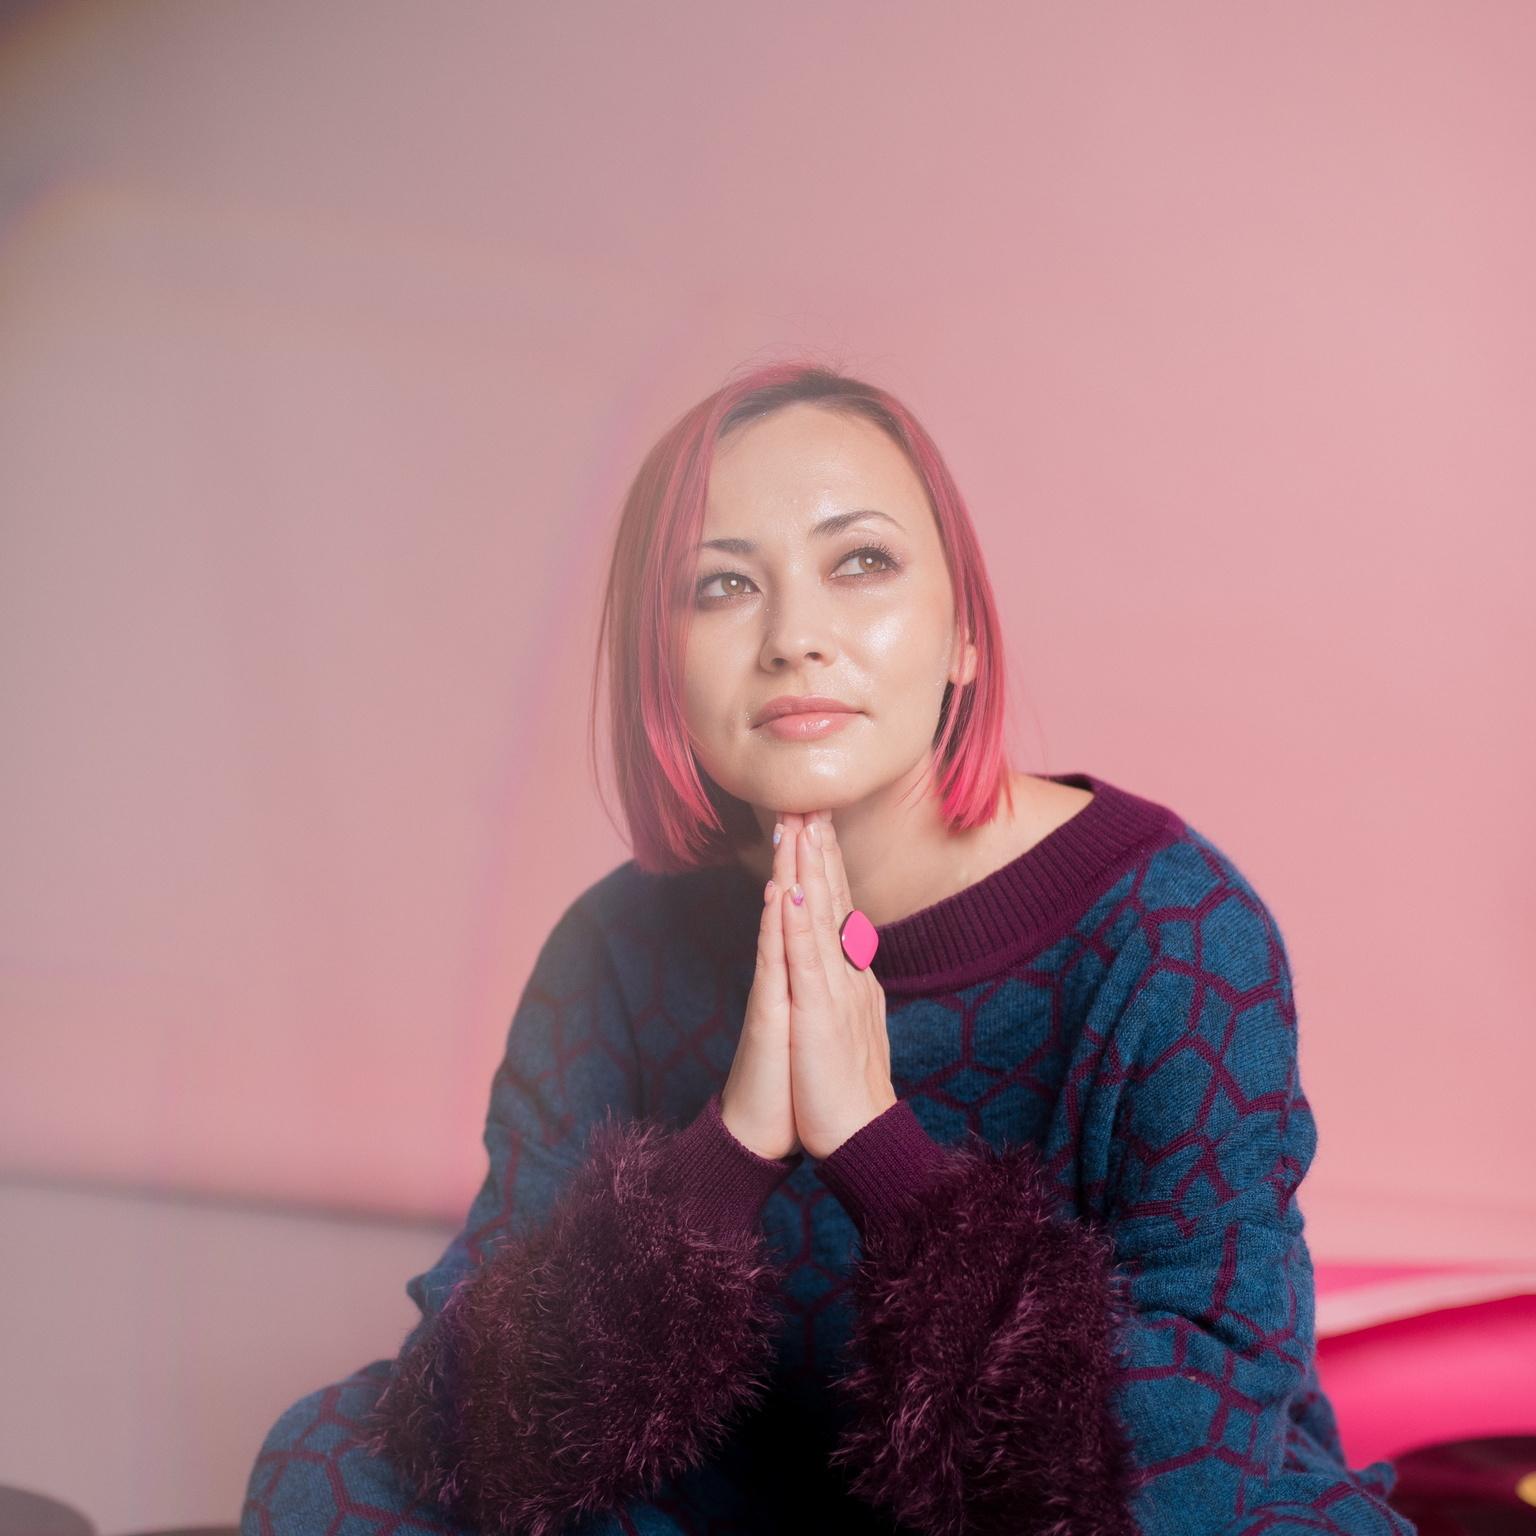 Композитор Roza FA: мечты, упорство и дар музыки